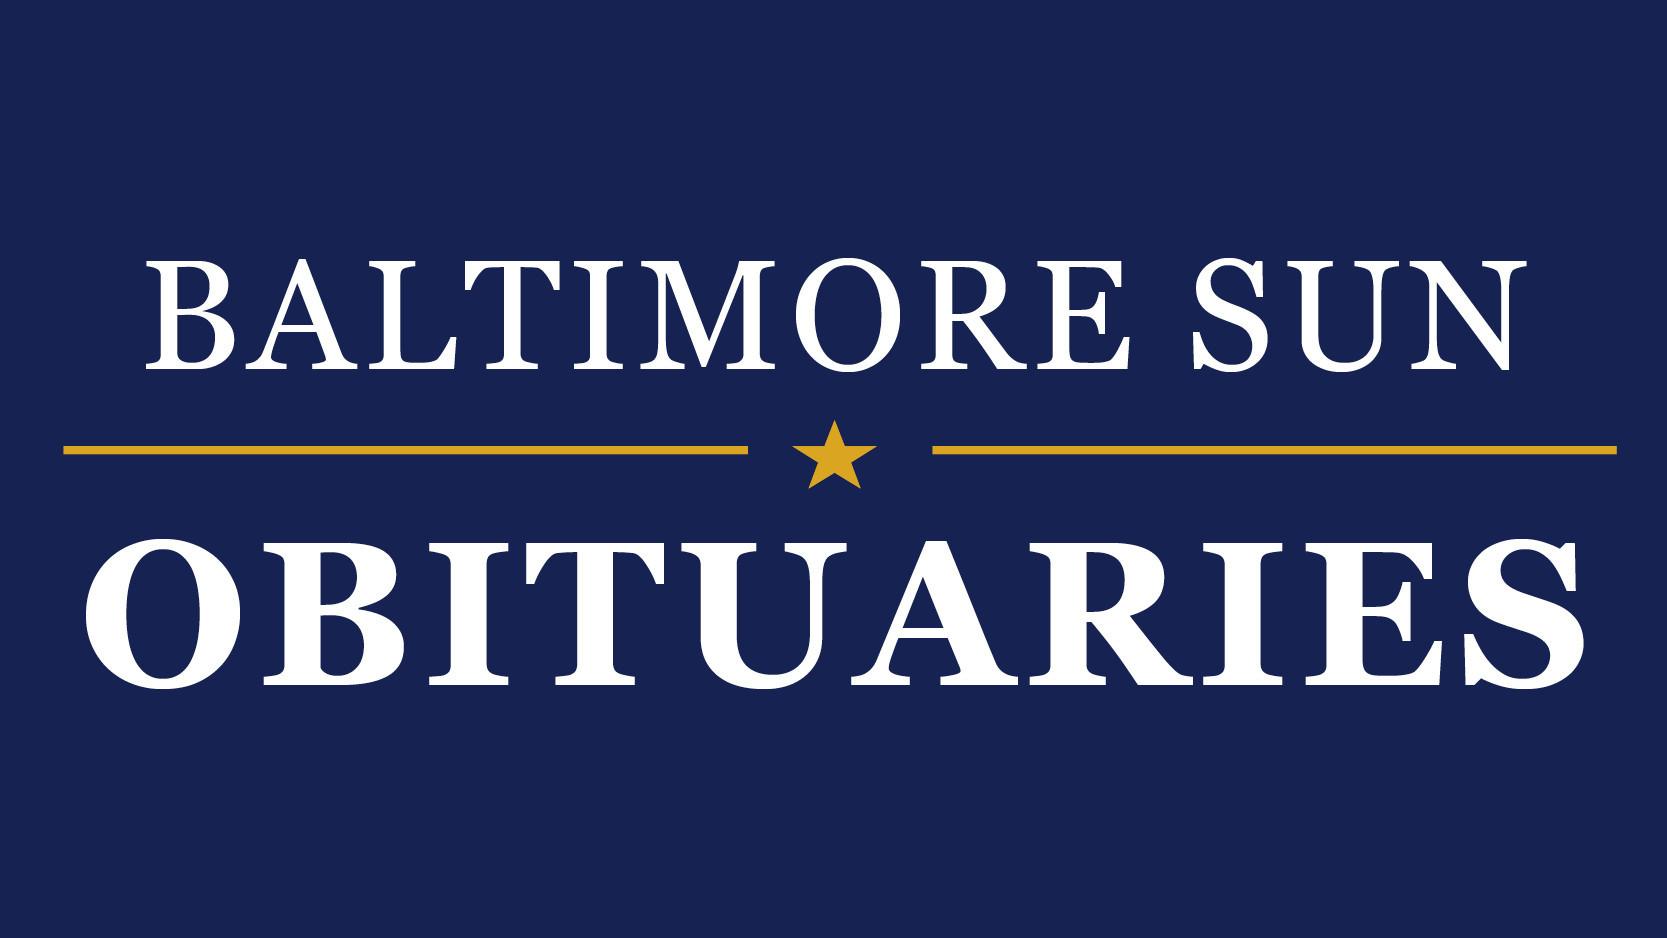 baltimore sun paper obituaries Baltimore sun death notices and death notices for baltimore maryland area explore life stories, offer condolences & send flowers.